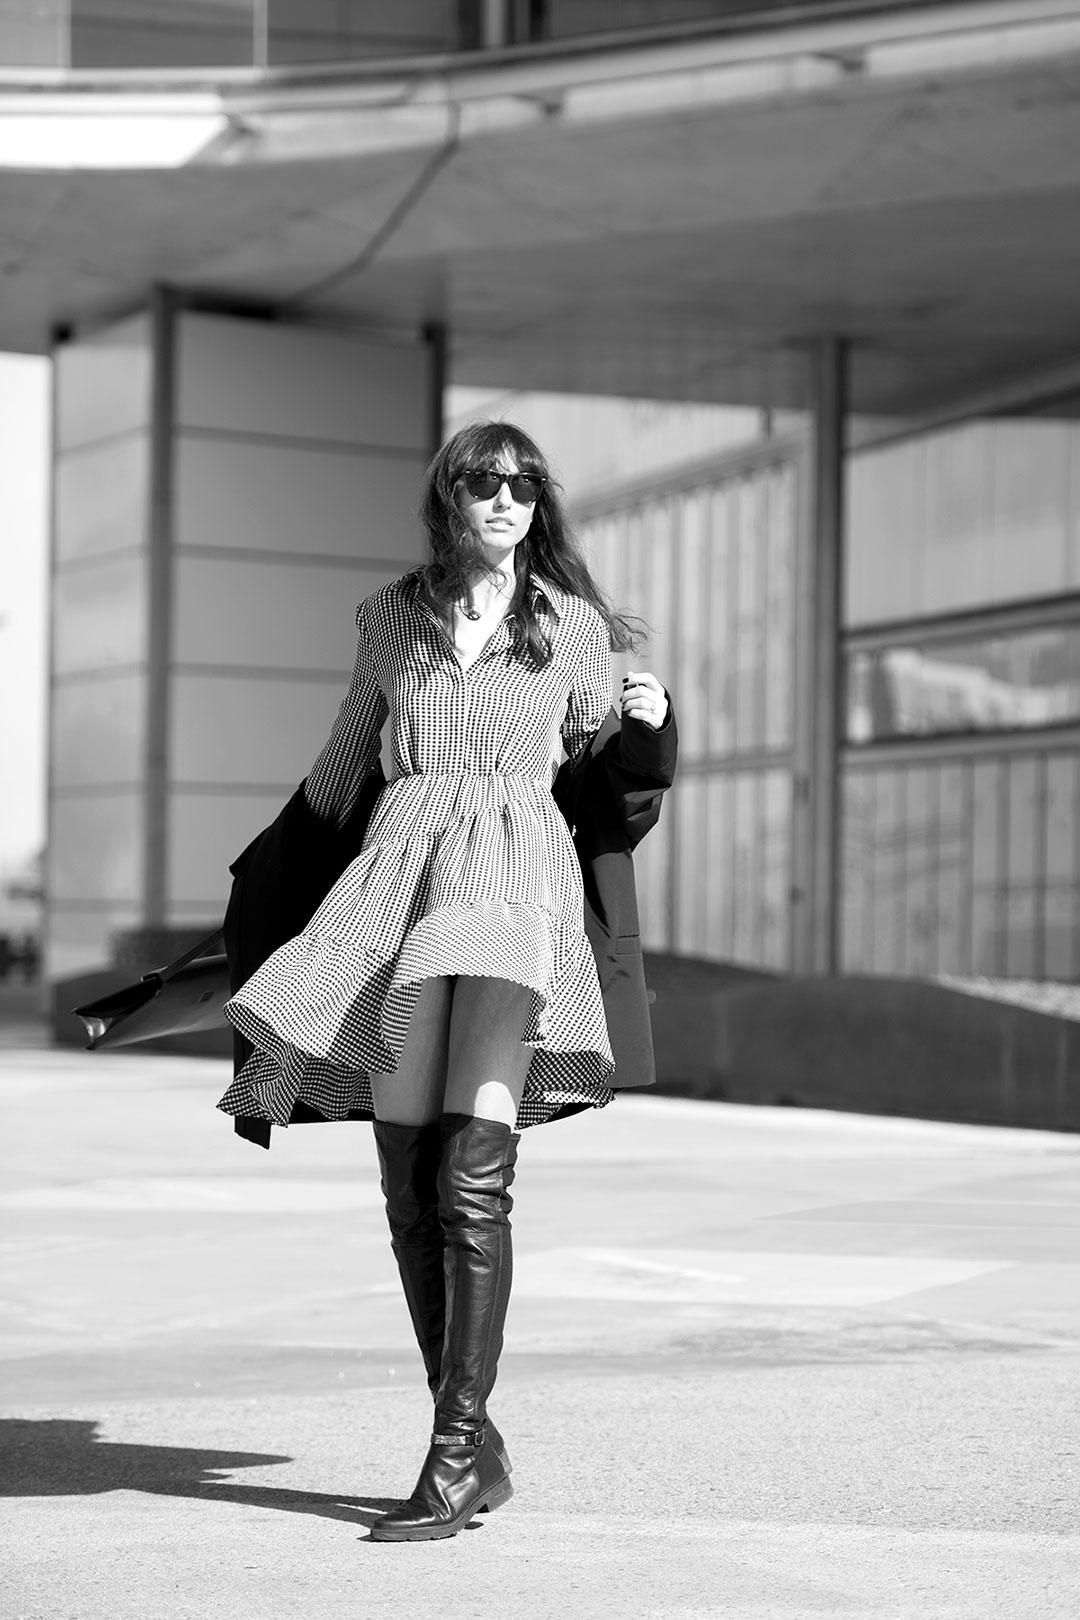 mbfwm-black-and-white-street-style-mitmeblog-bn-web-18